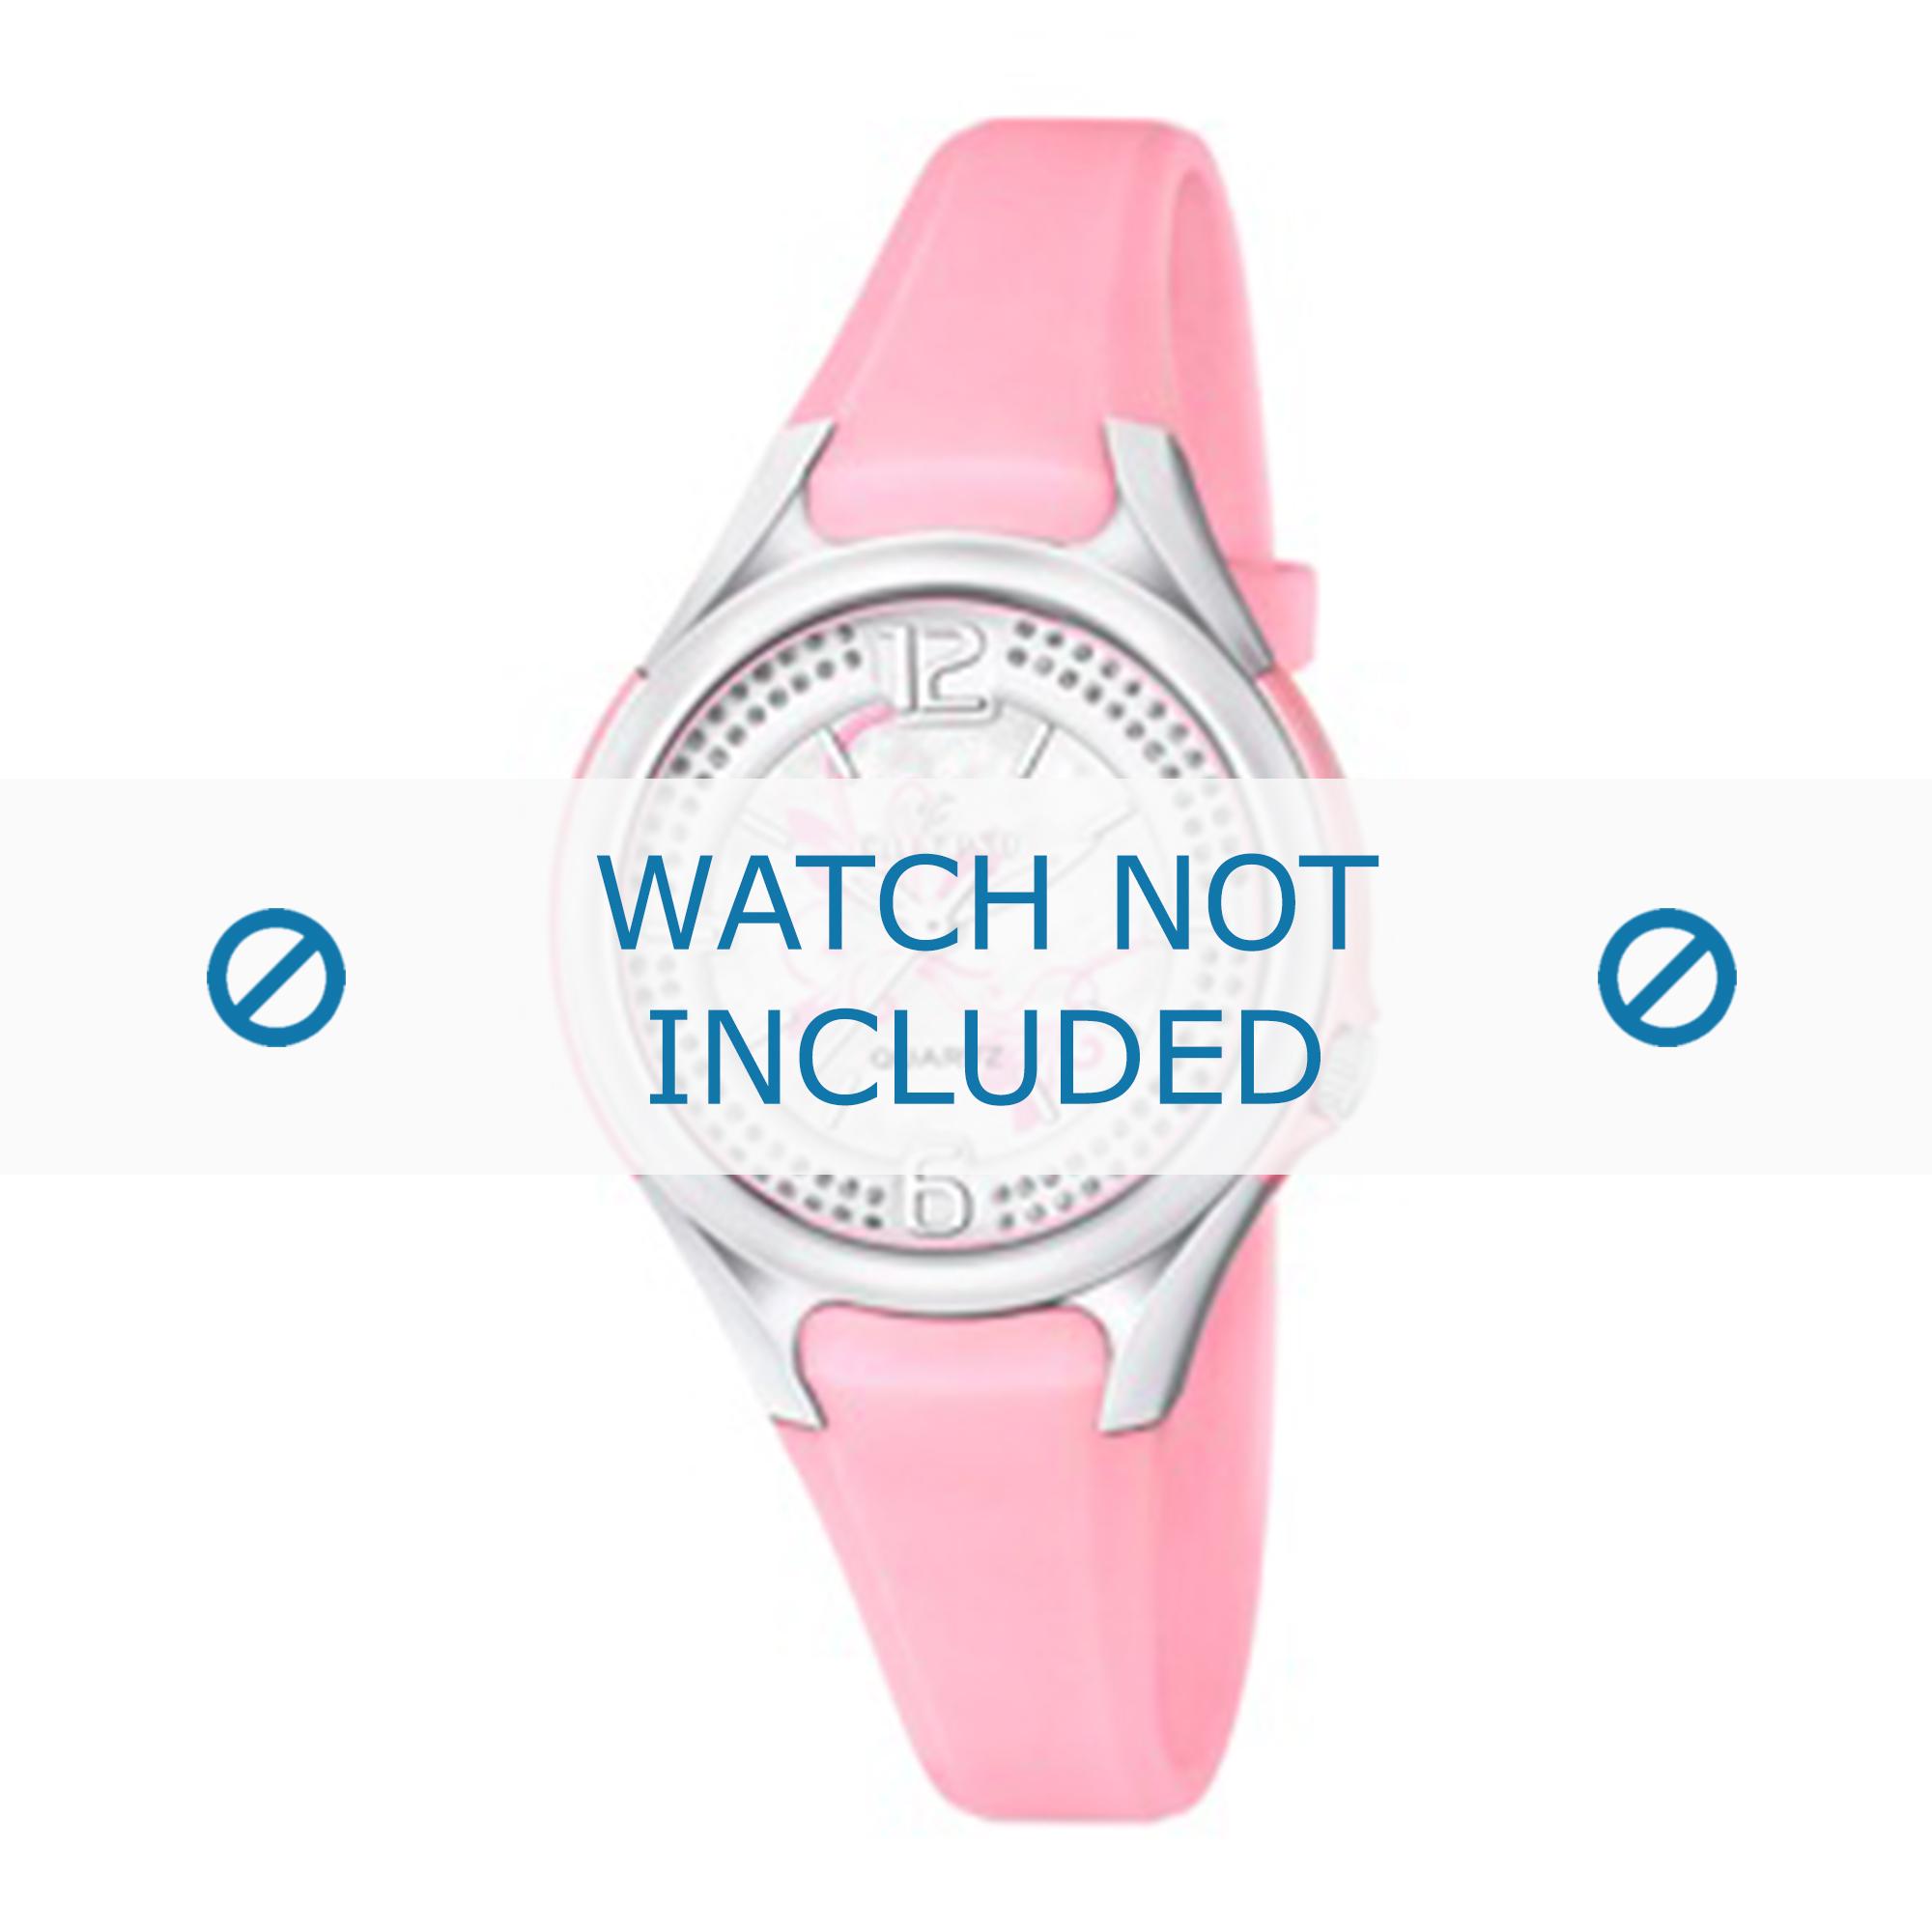 Calypso horlogeband K5575-2 Rubber Roze